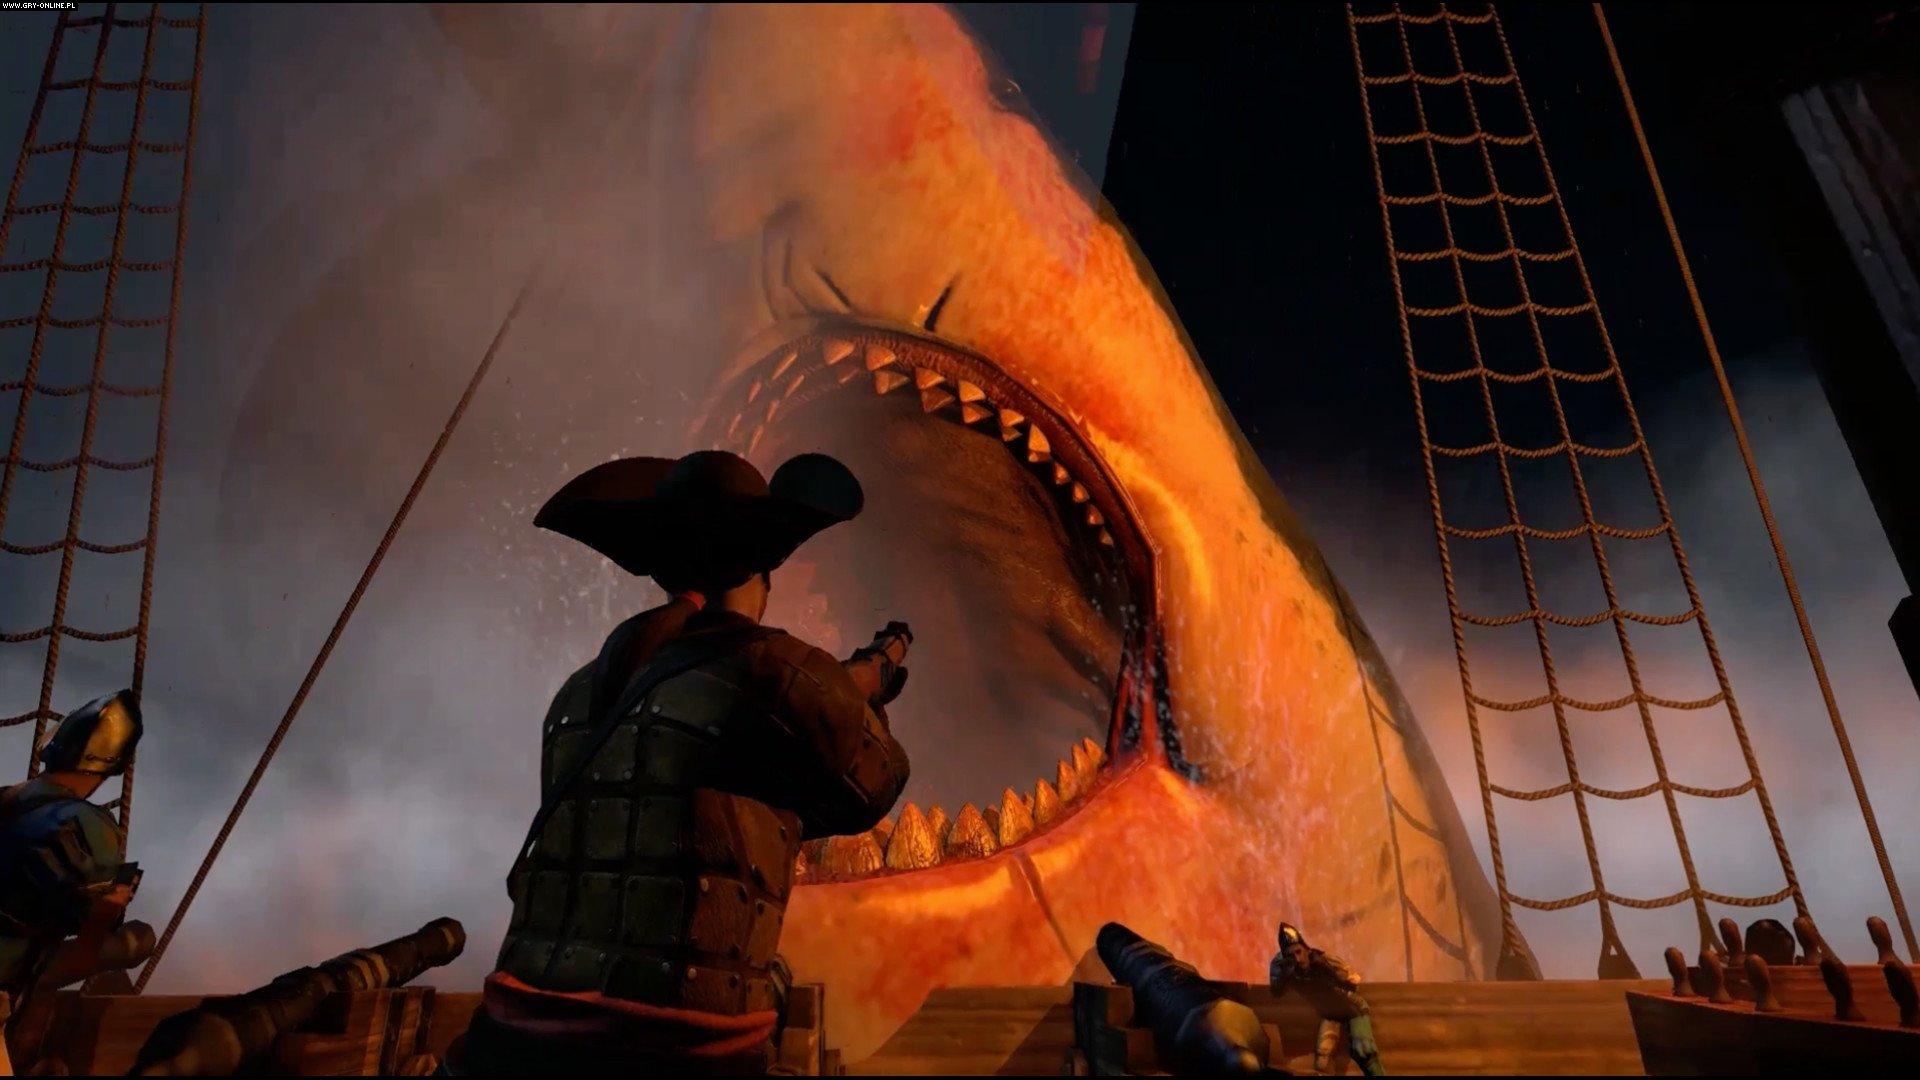 Man O' War: Corsair PC Games Image 3/51, Evil Twin Games